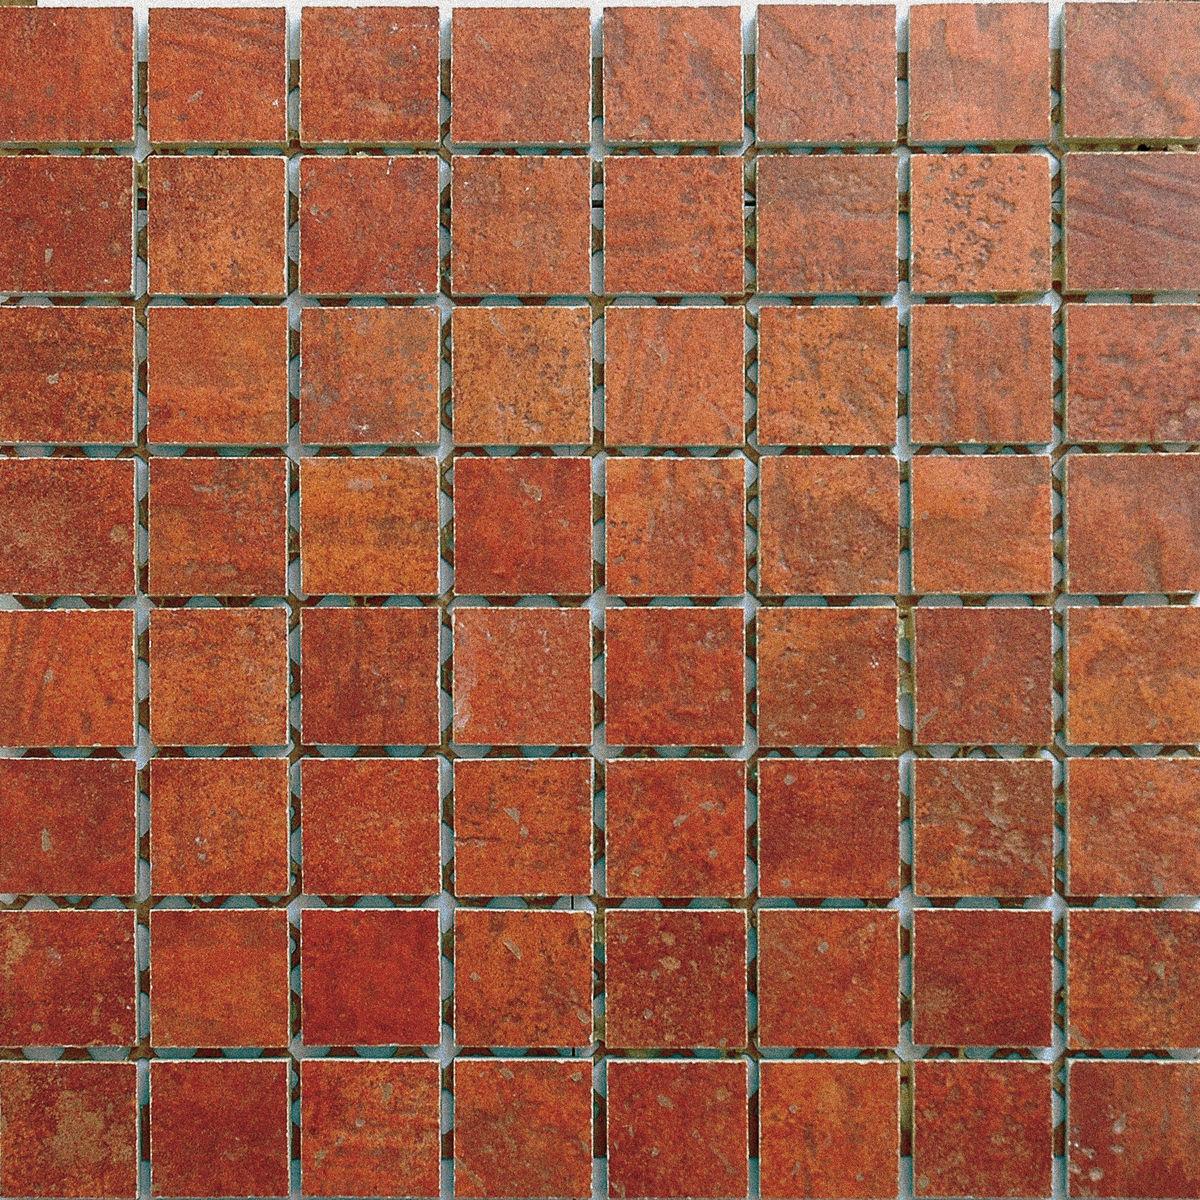 Мозаика Cotto Classico rosso (mqax22) изображение 0